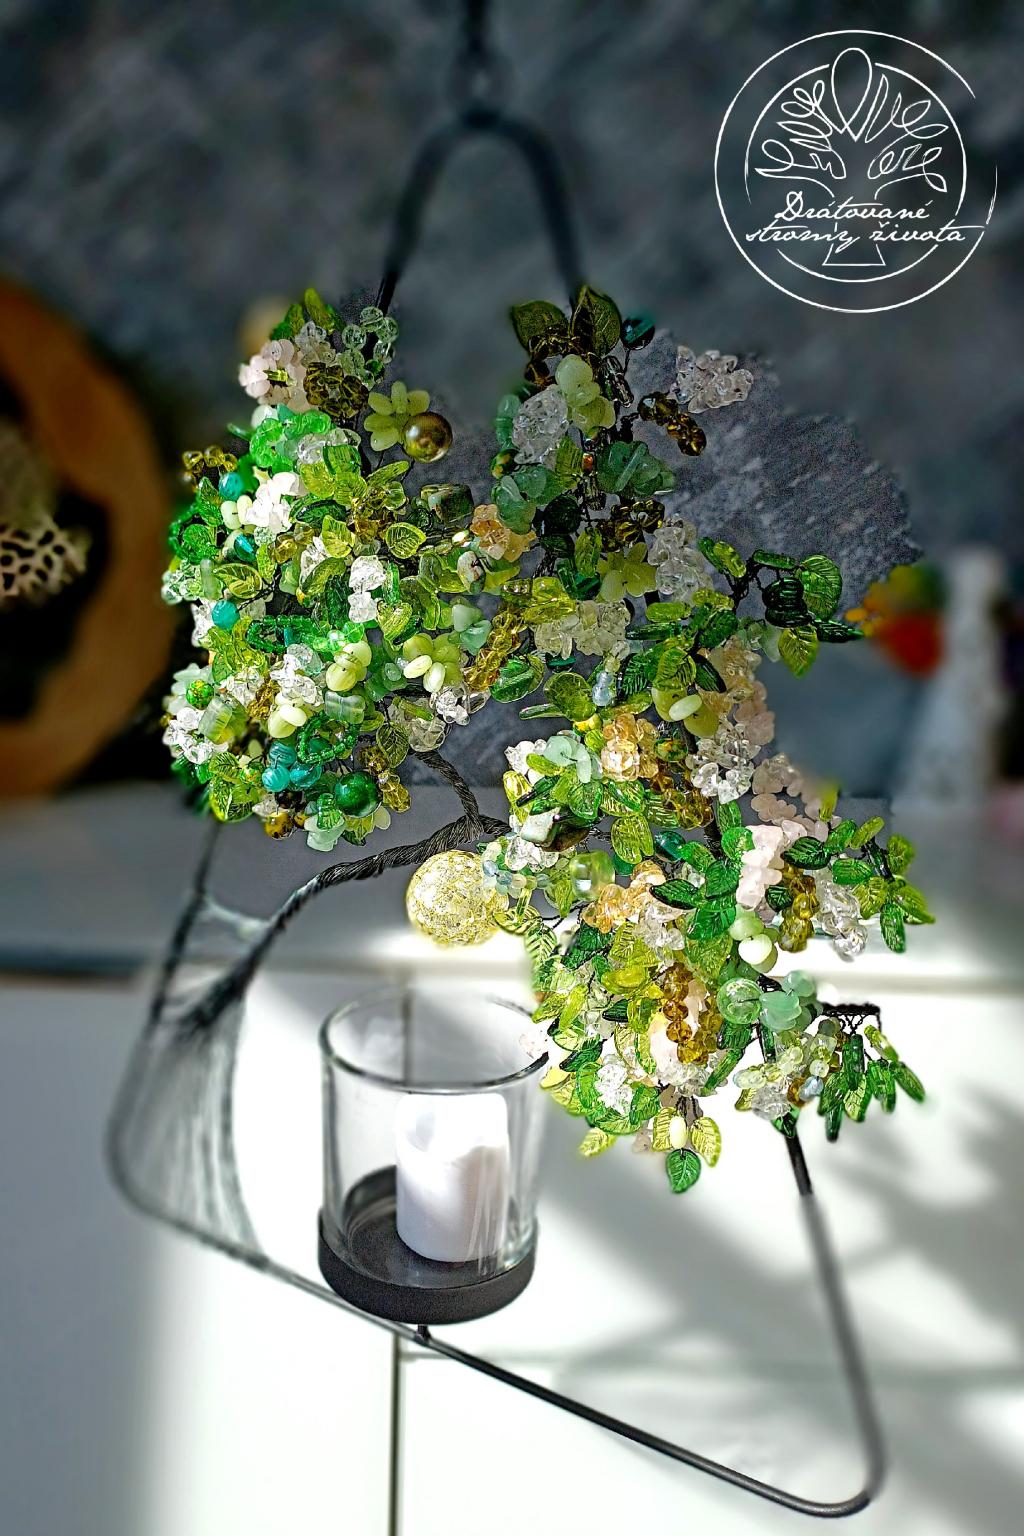 Strom života Nové počátky a regenerace 40x30cm